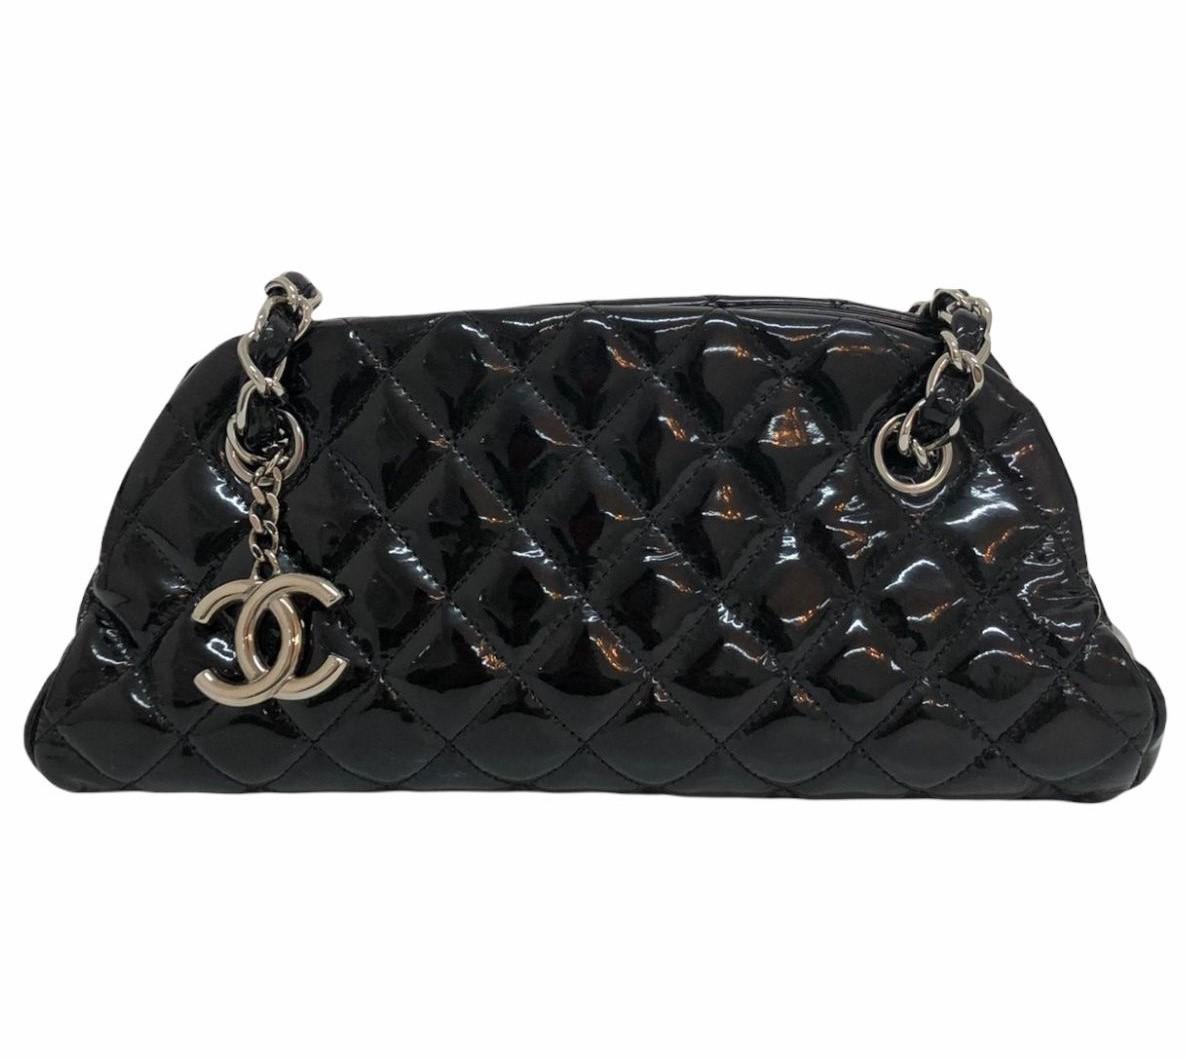 Bolsa Chanel Just Madeimoselle Small Preta